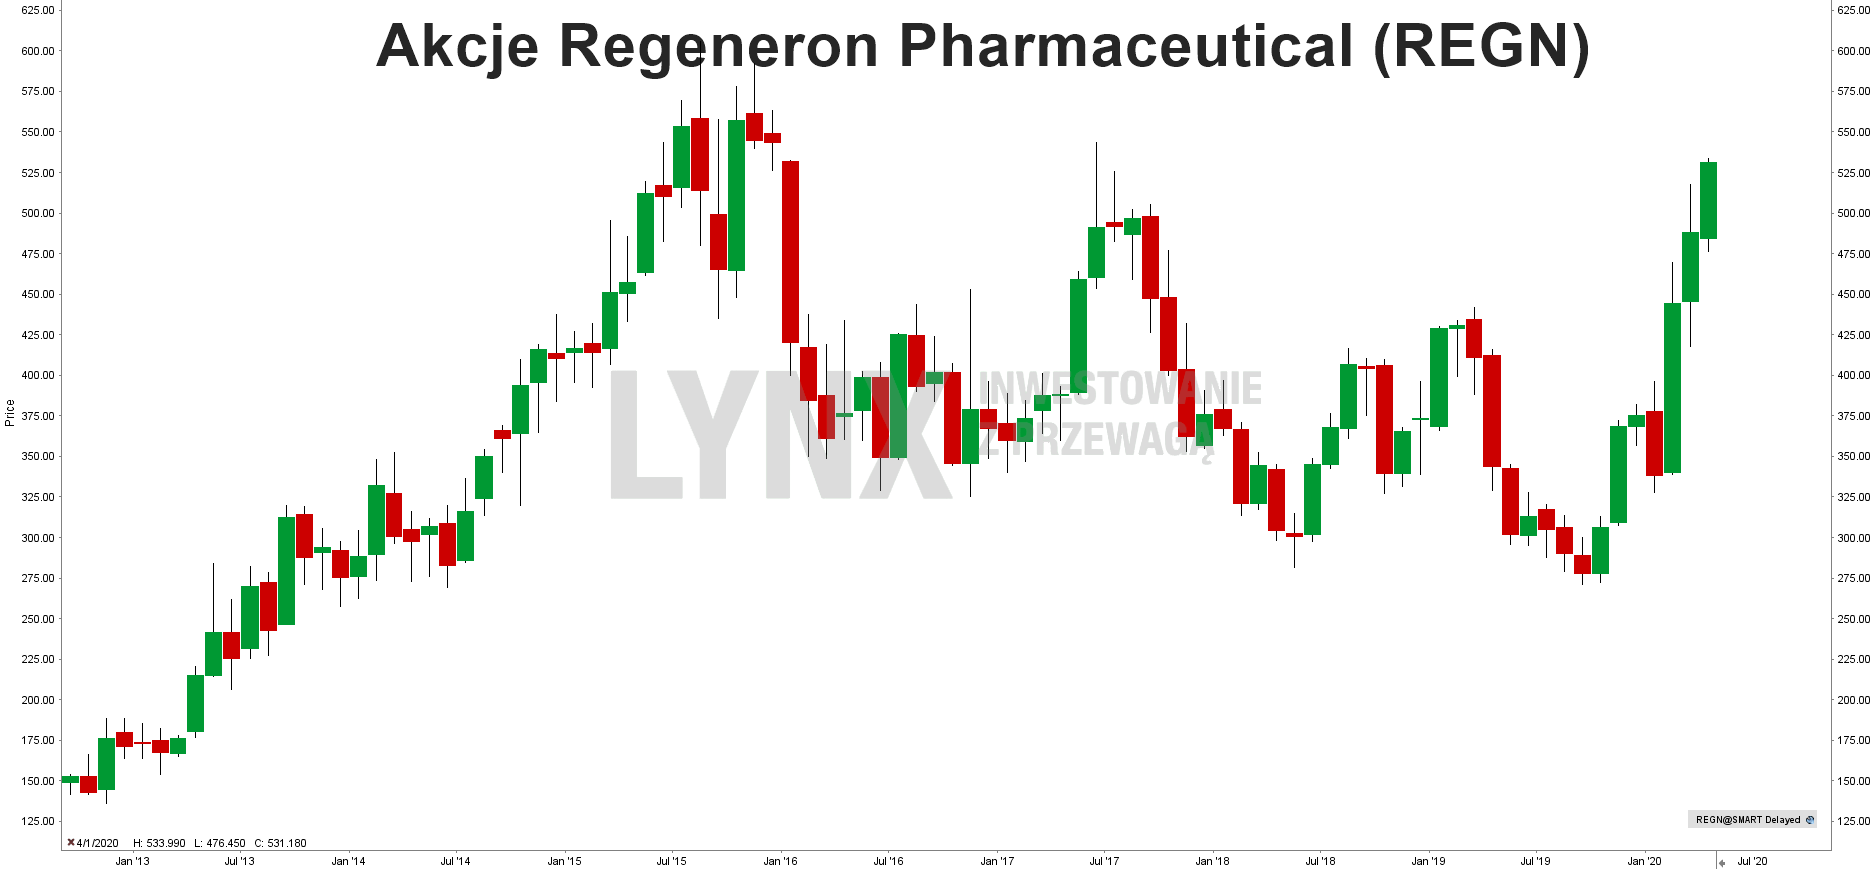 Akcje Regeneron Pharmaceutical